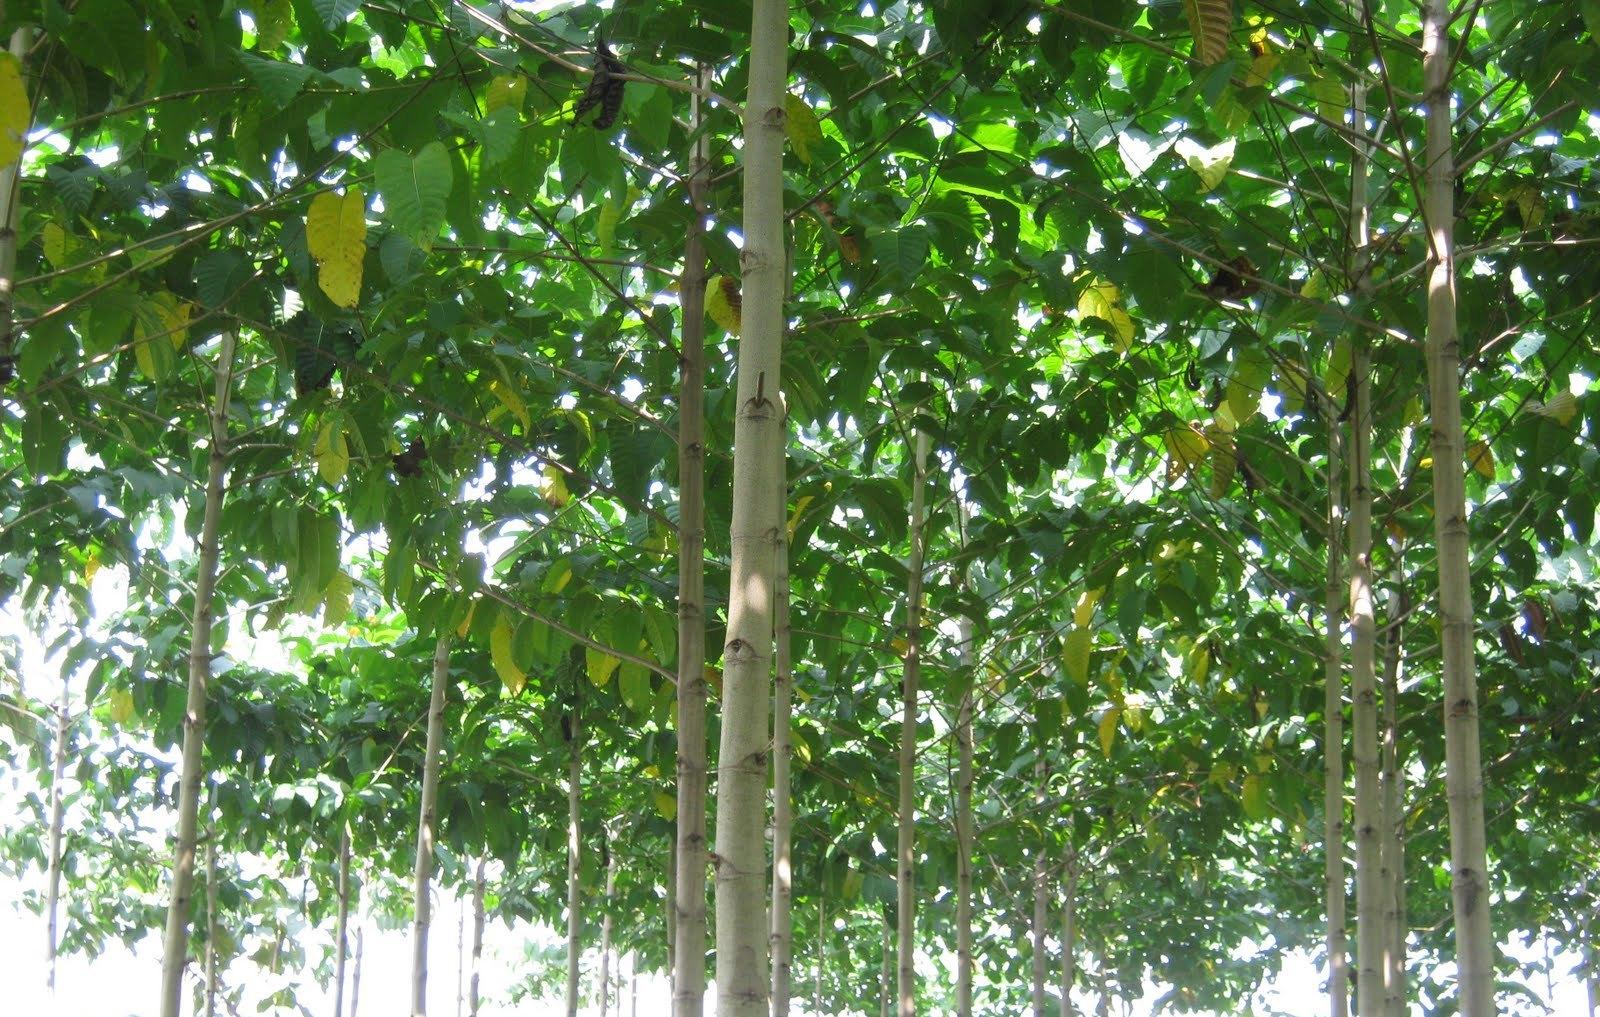 Tumbuh tanaman yang termasuk famili rubiaceae ini tumbuh baik pada